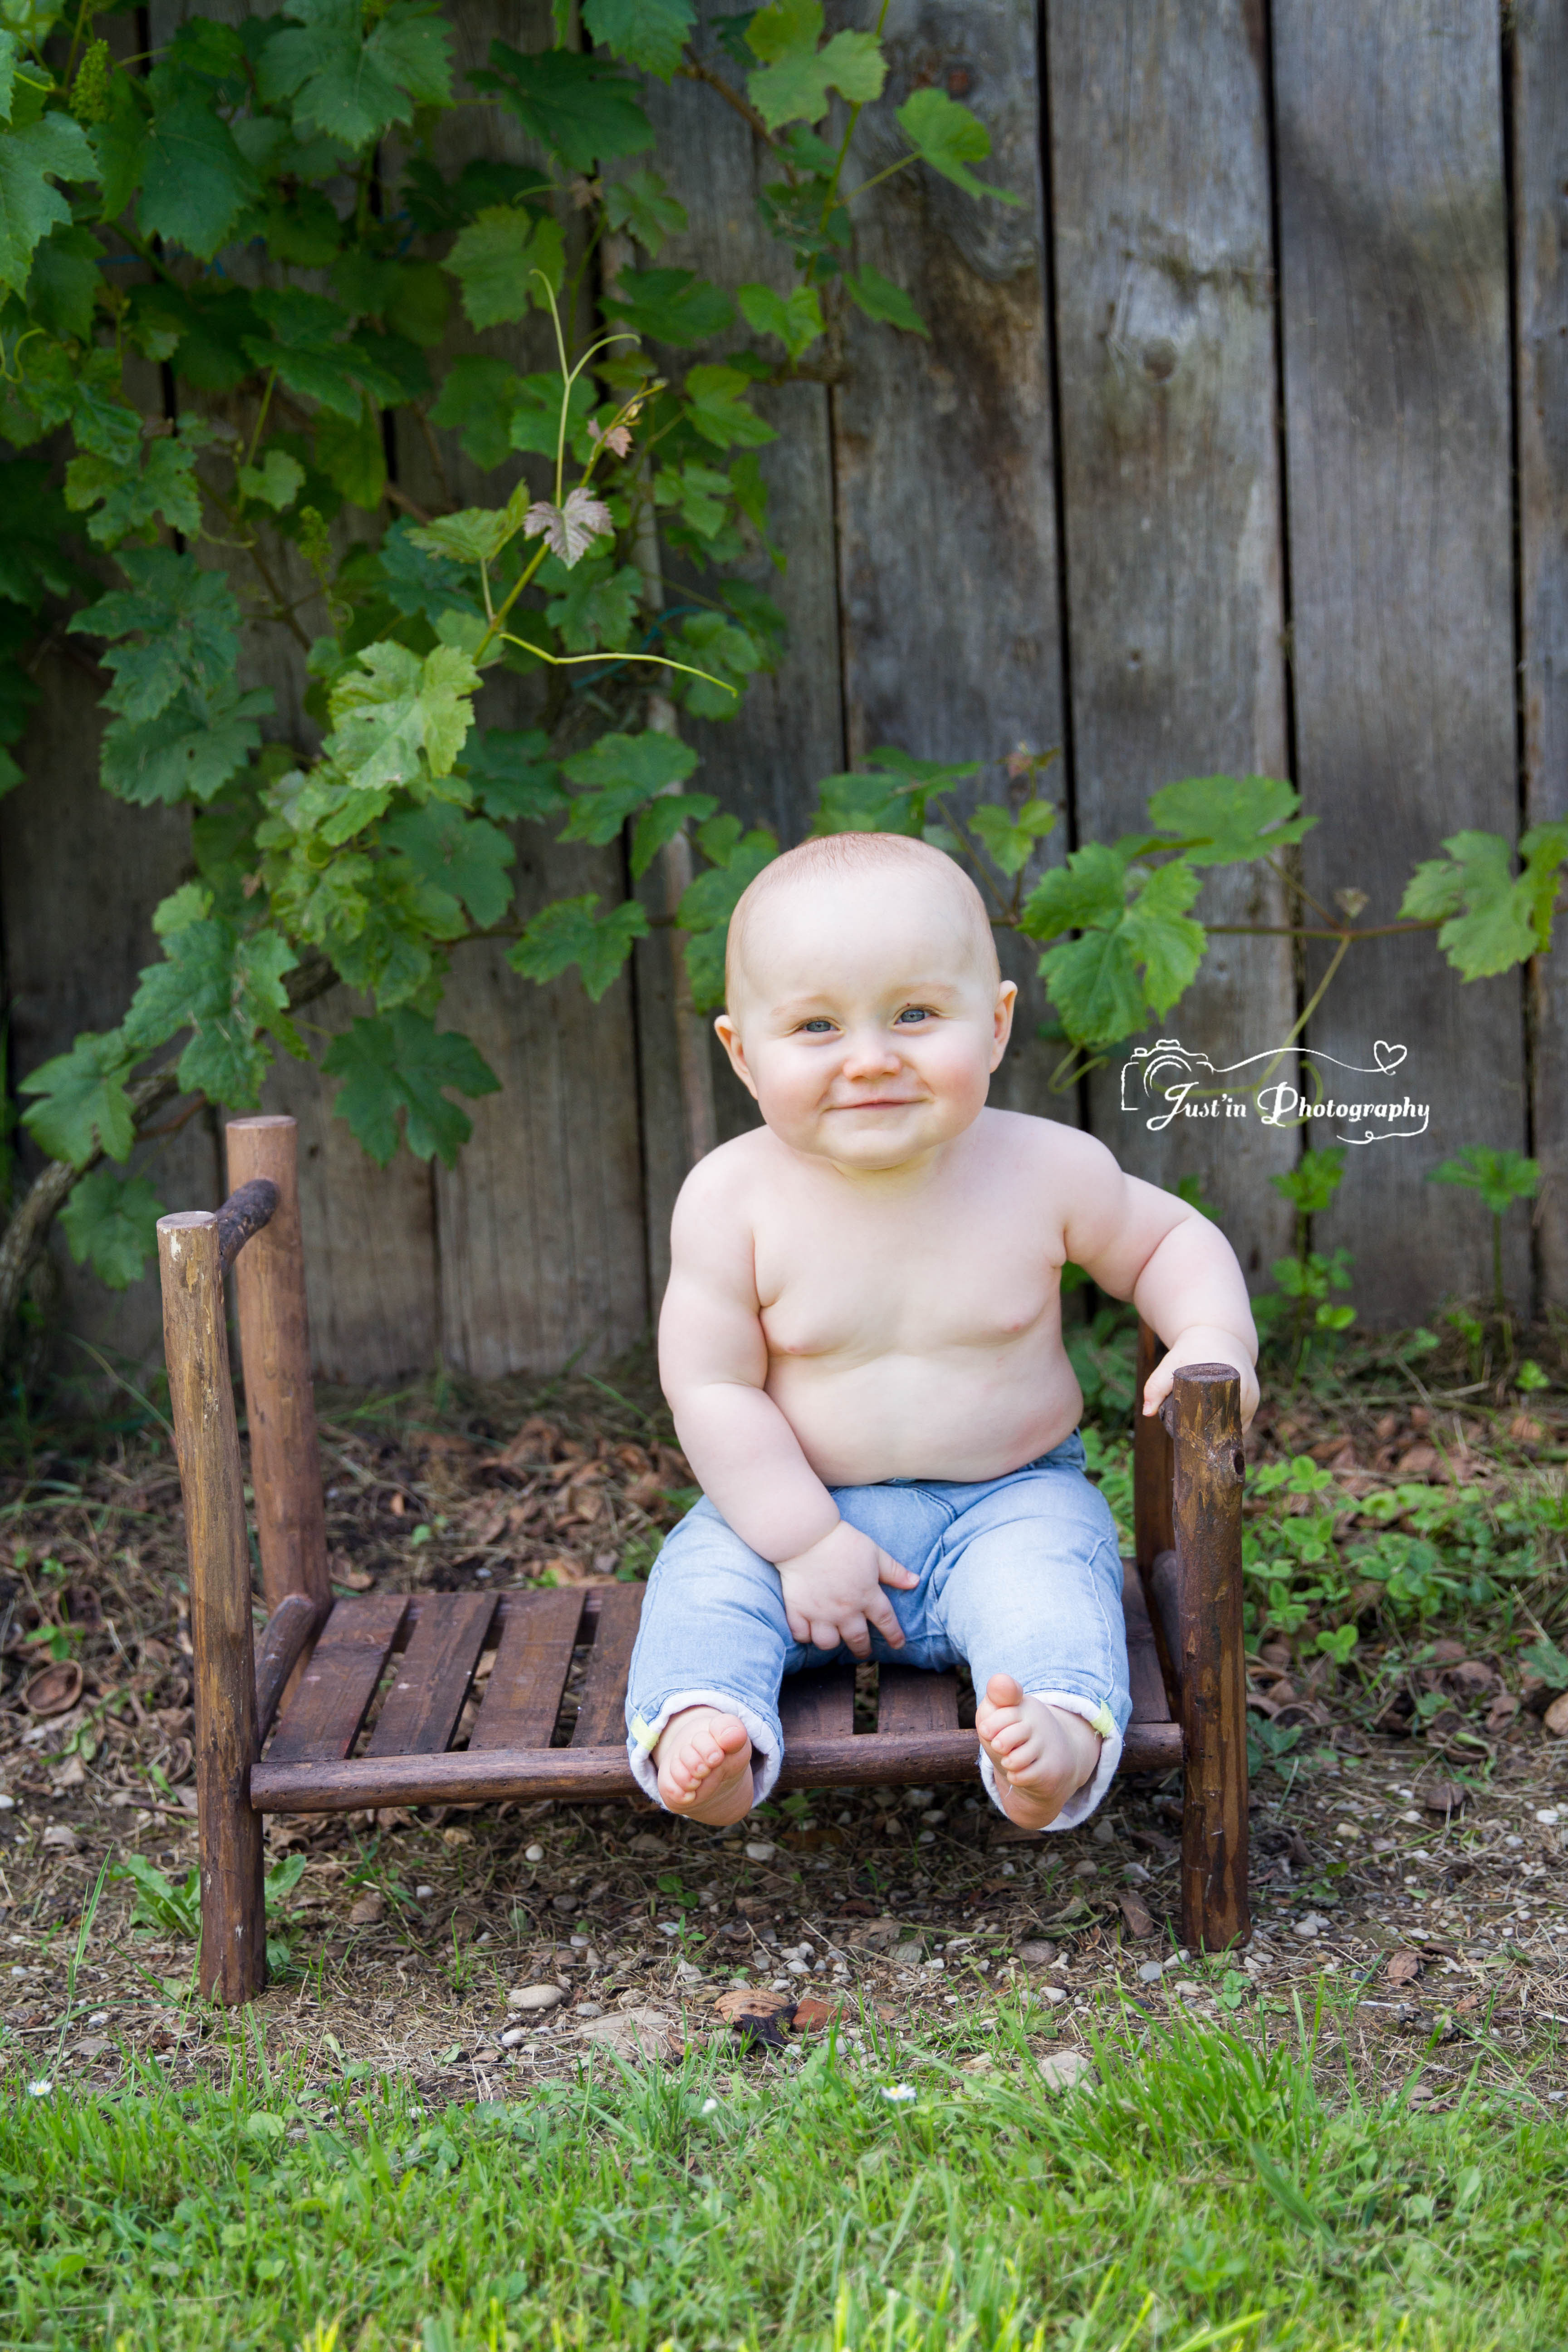 Justin Photography enfants bébé 5-12